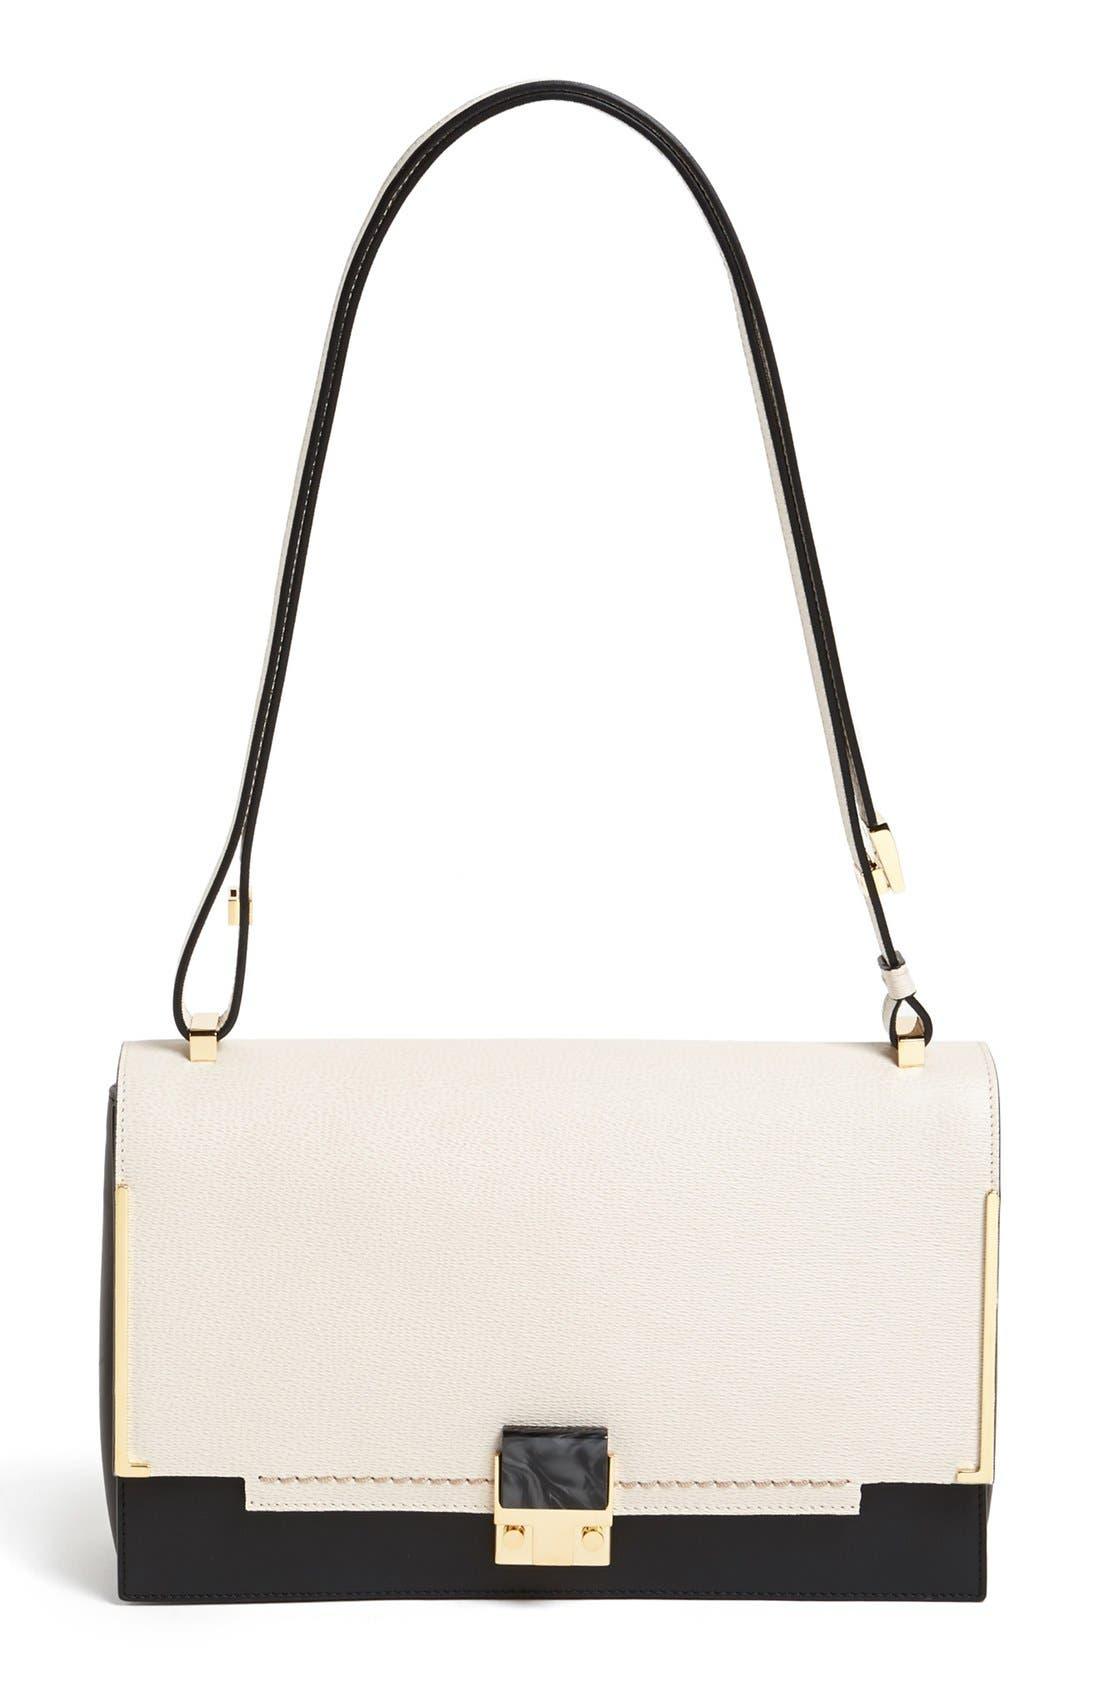 Main Image - Lanvin 'Medium Partition' Shoulder Bag